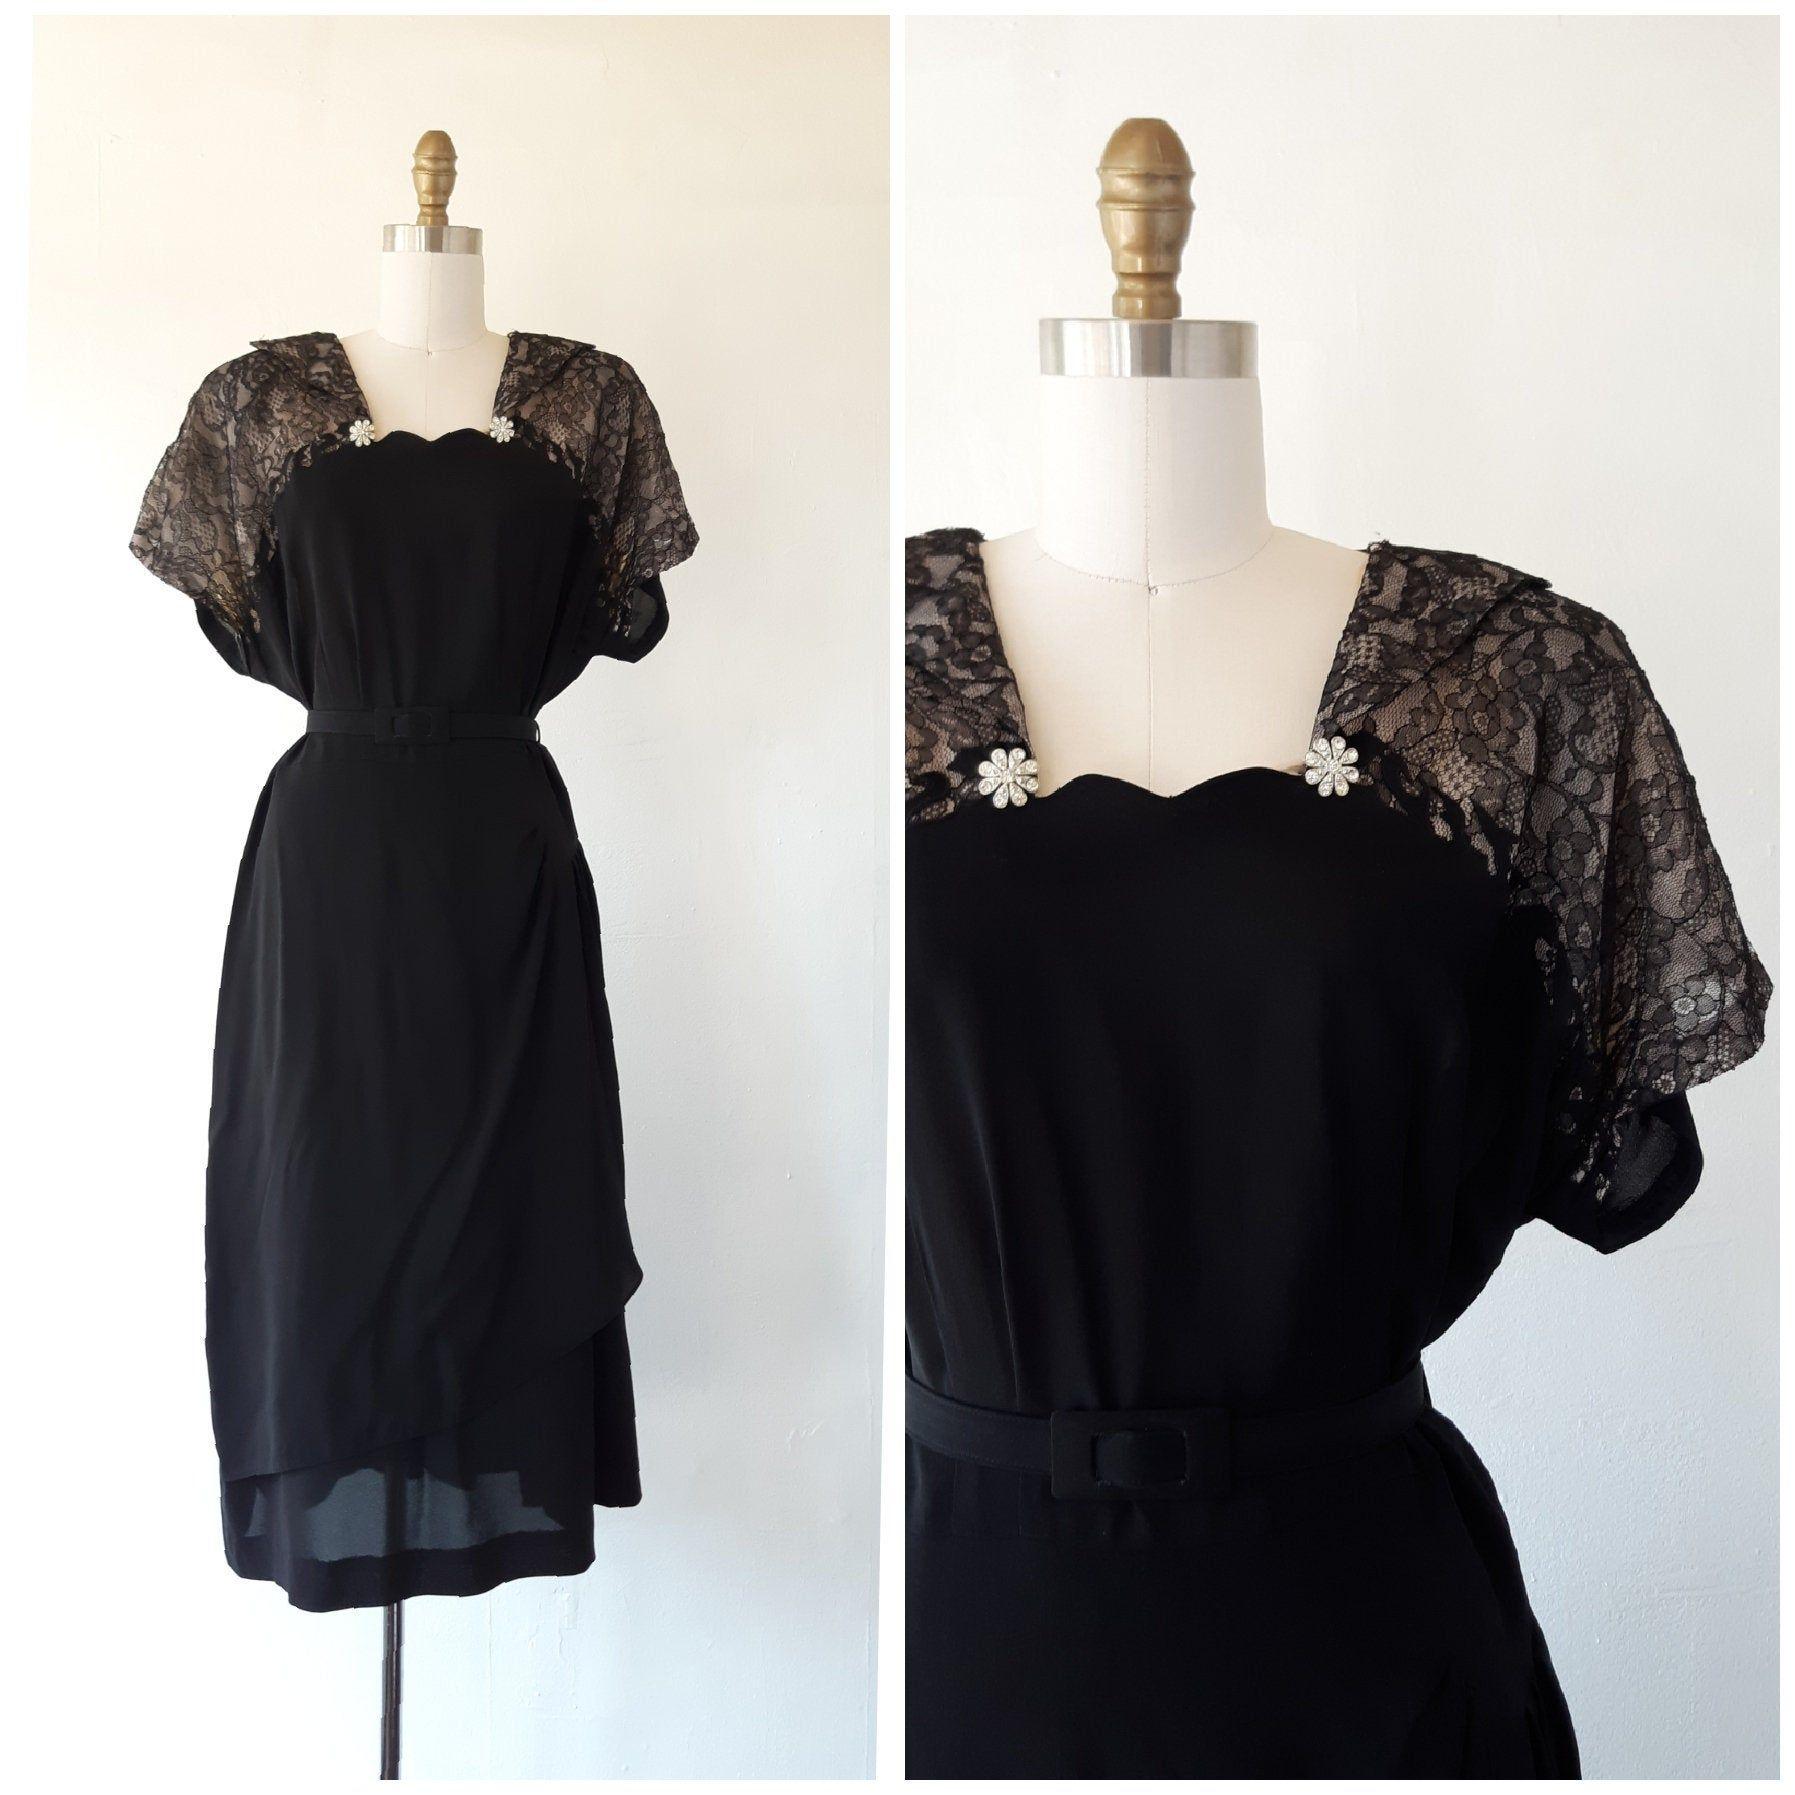 1950s Black Dress Vintage 1950s Black And Pink Lace Formal Etsy 1950s Black Dress Vintage Black Dress Pink Evening Dress [ 1795 x 1795 Pixel ]